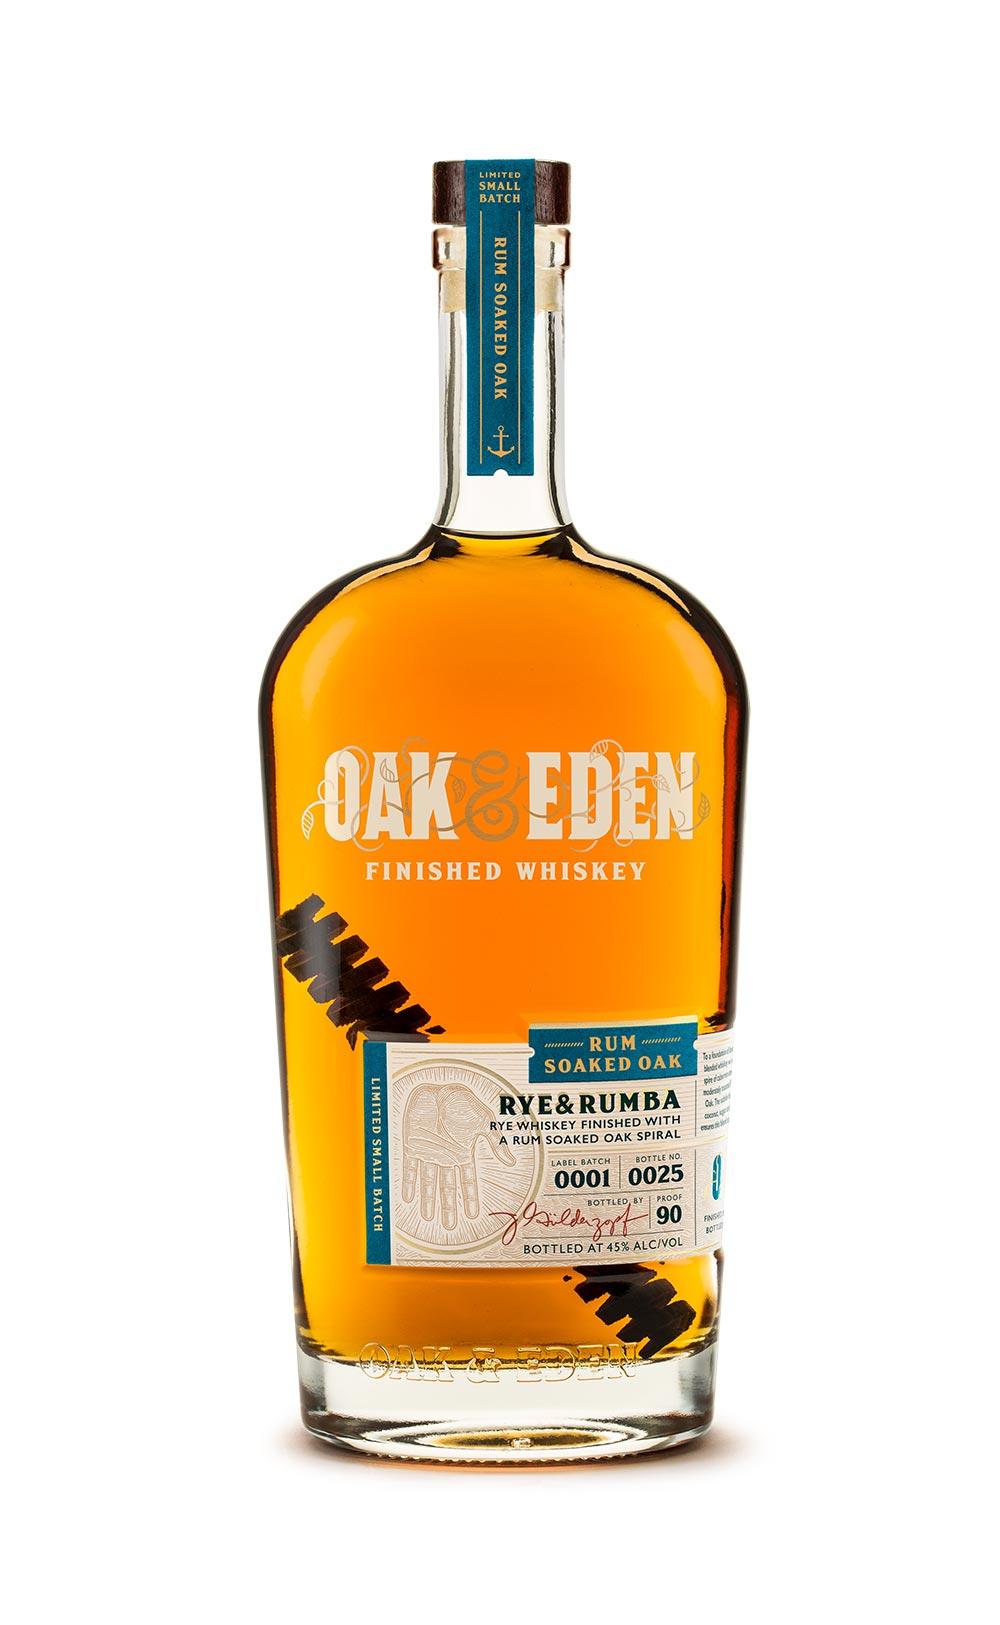 Oak & Eden Rye & Rumba